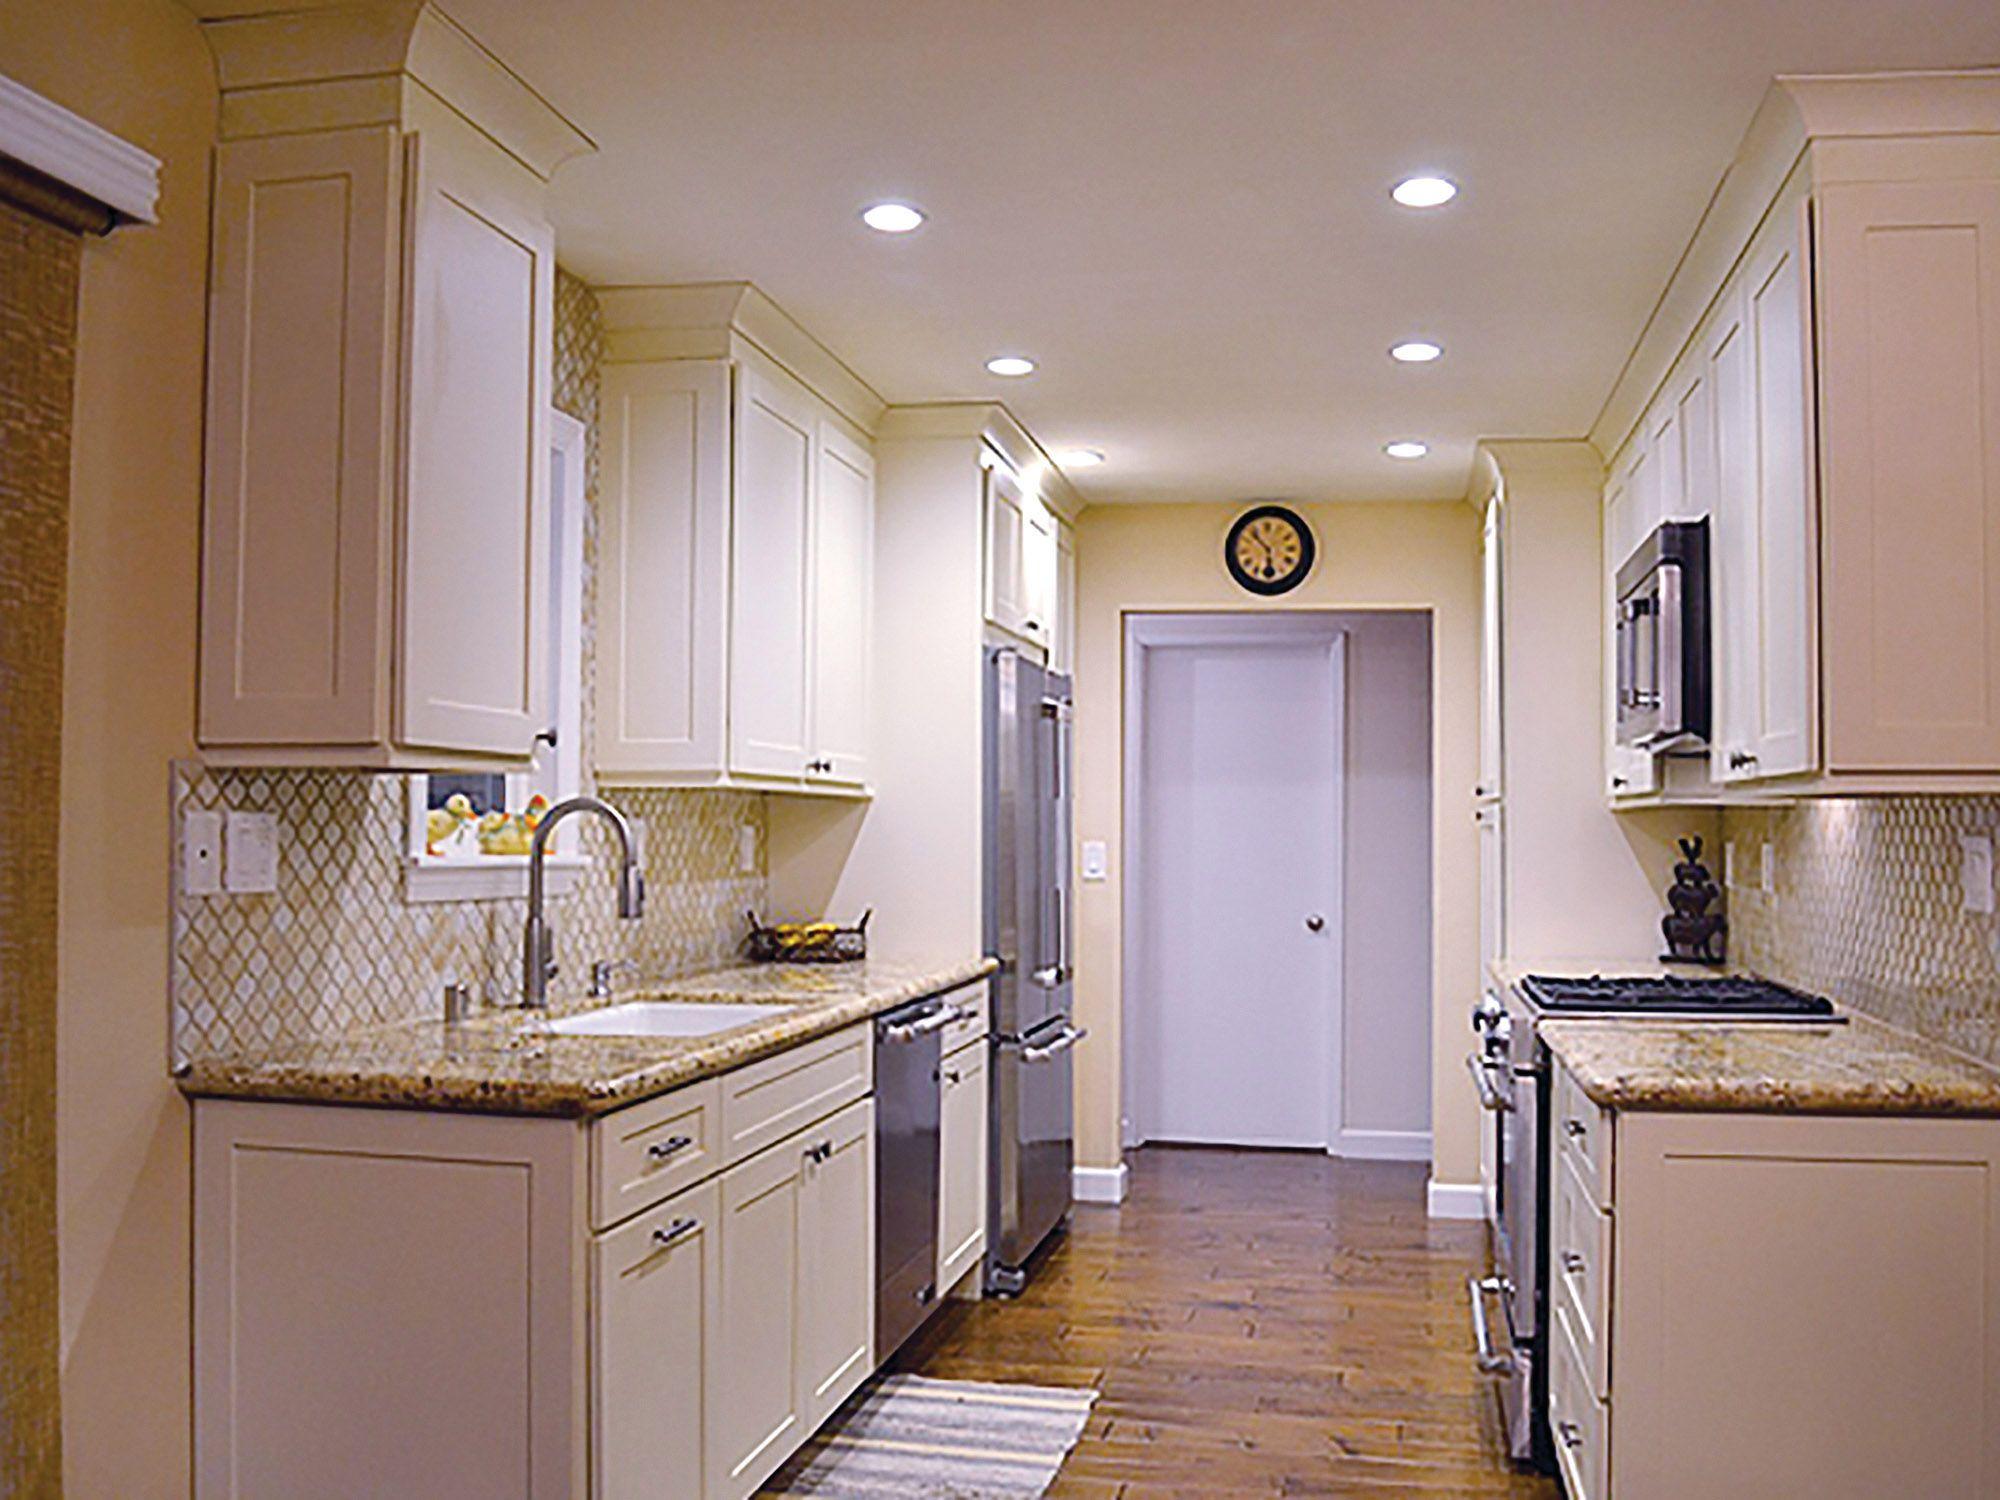 Pleasanton California kitchen renovation features ...